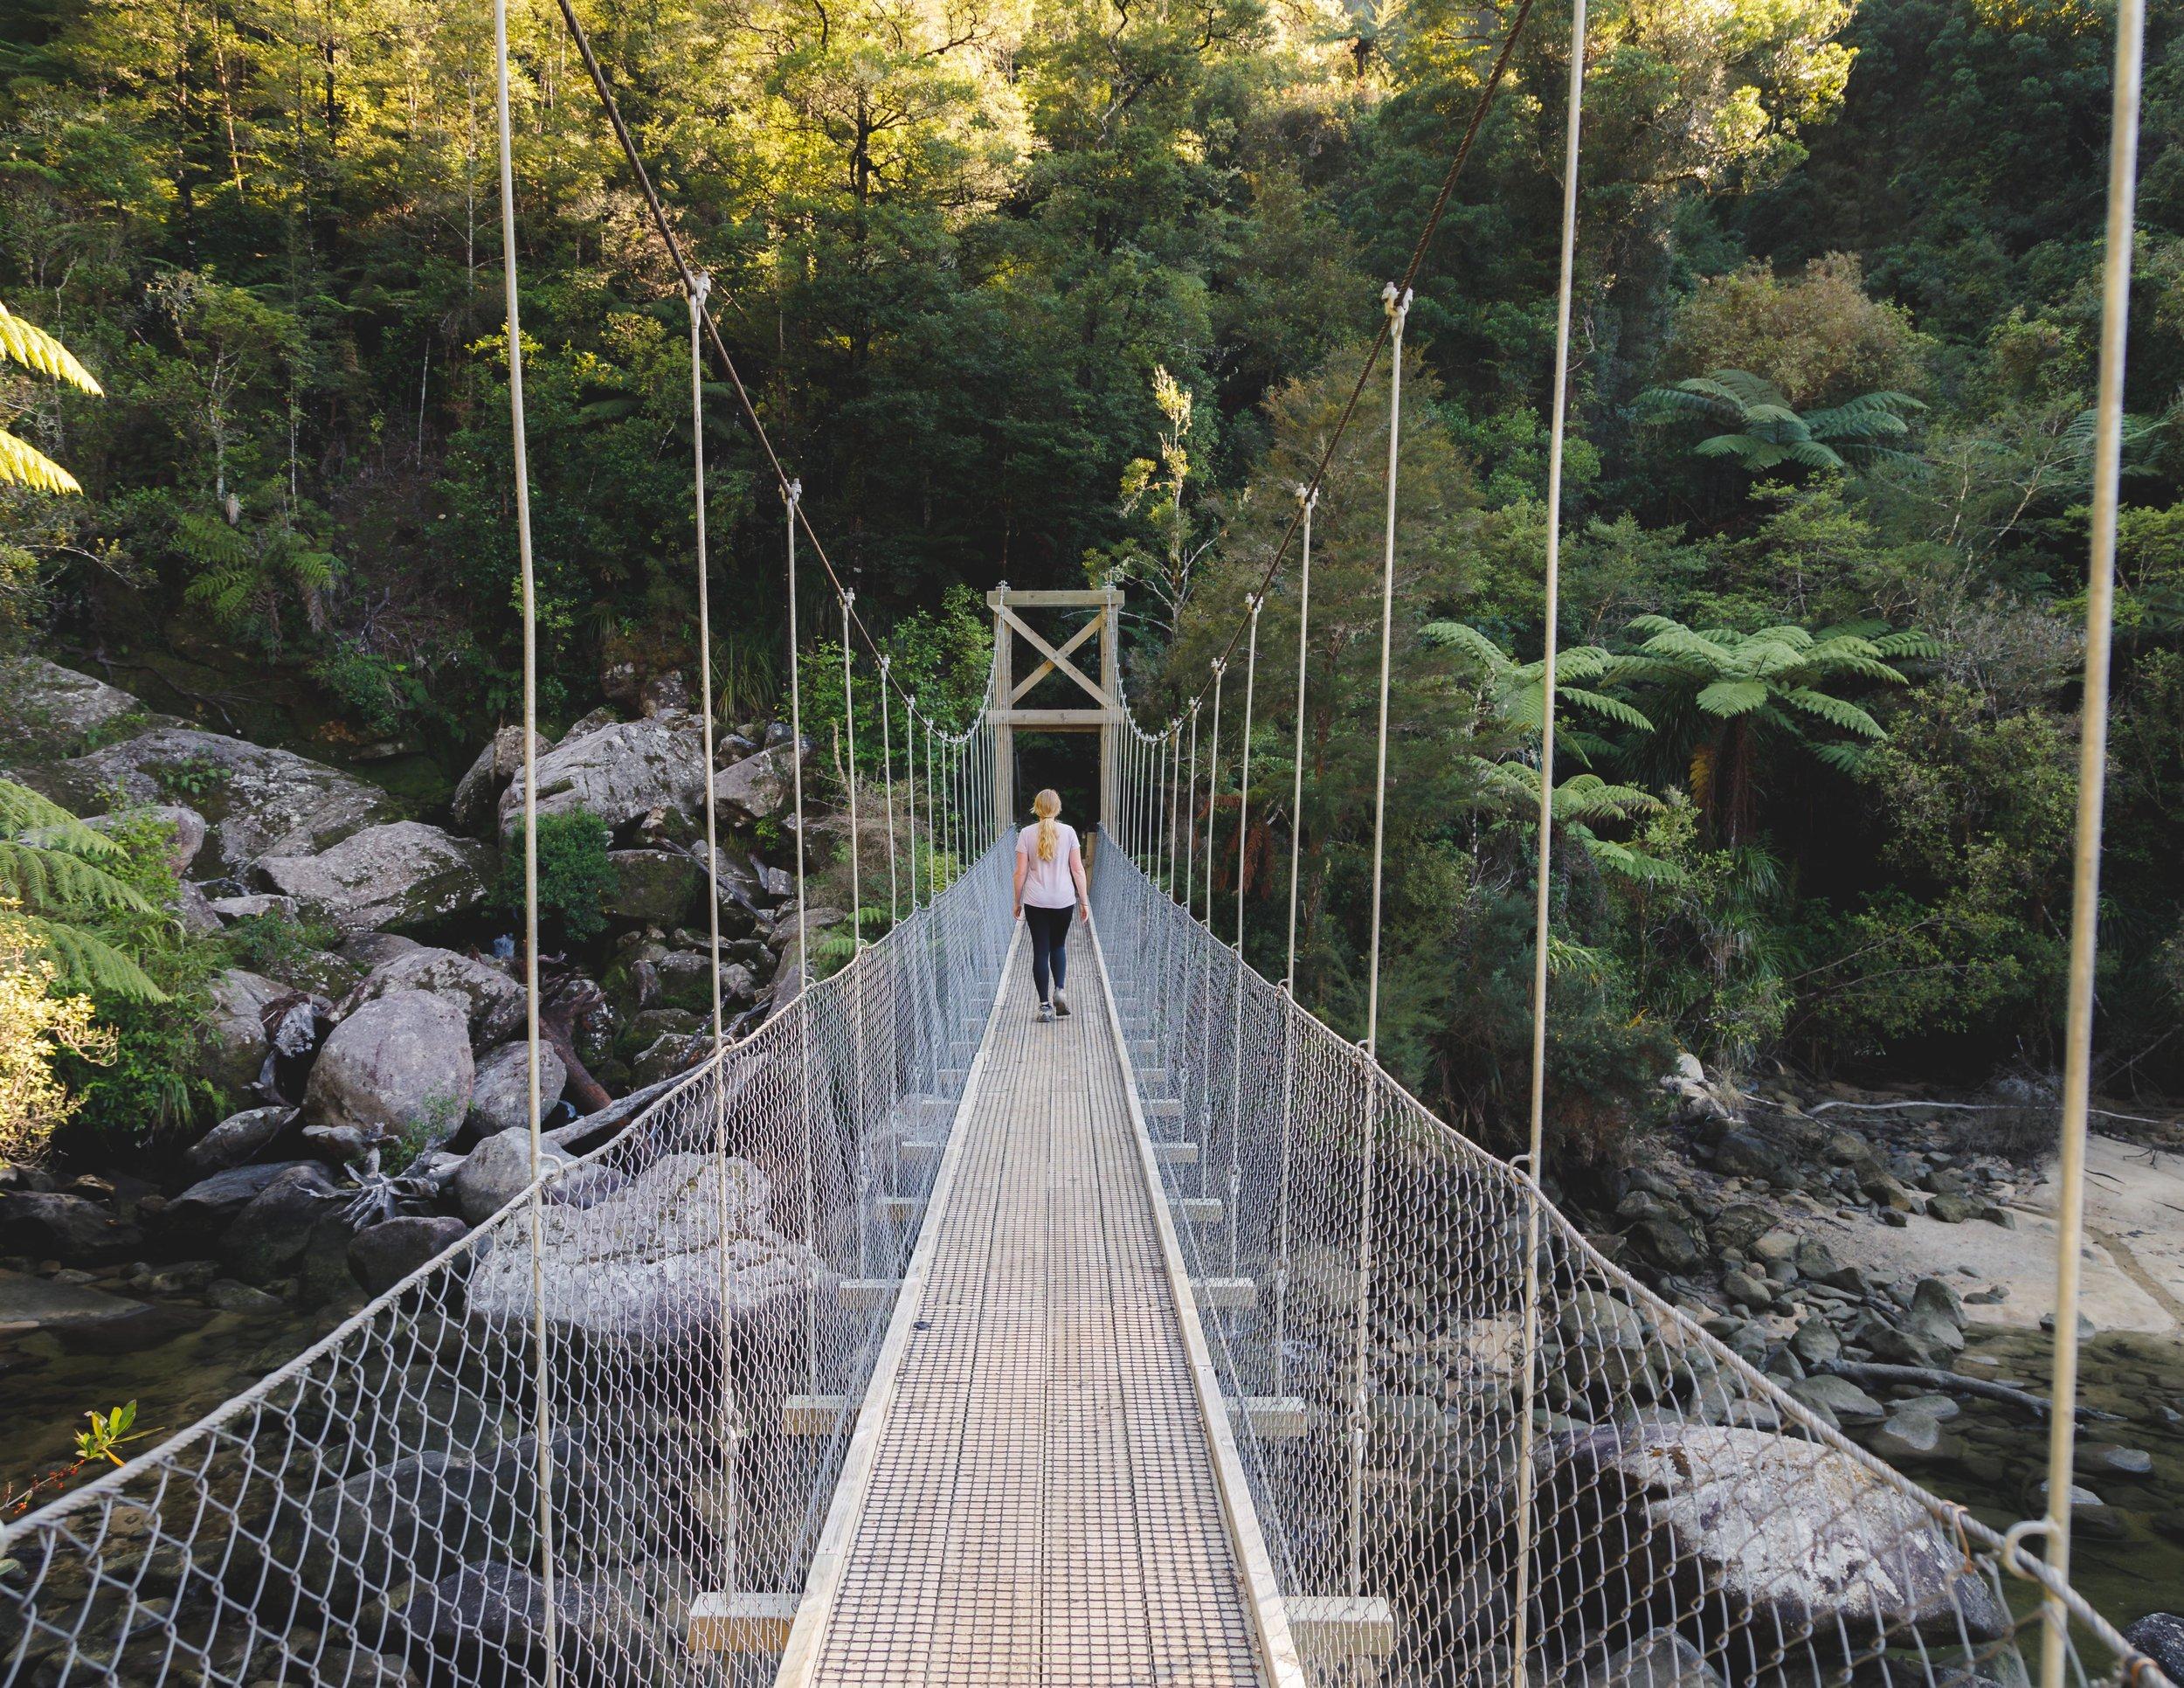 The suspension bridge near Bark Bay, Abel Tasman